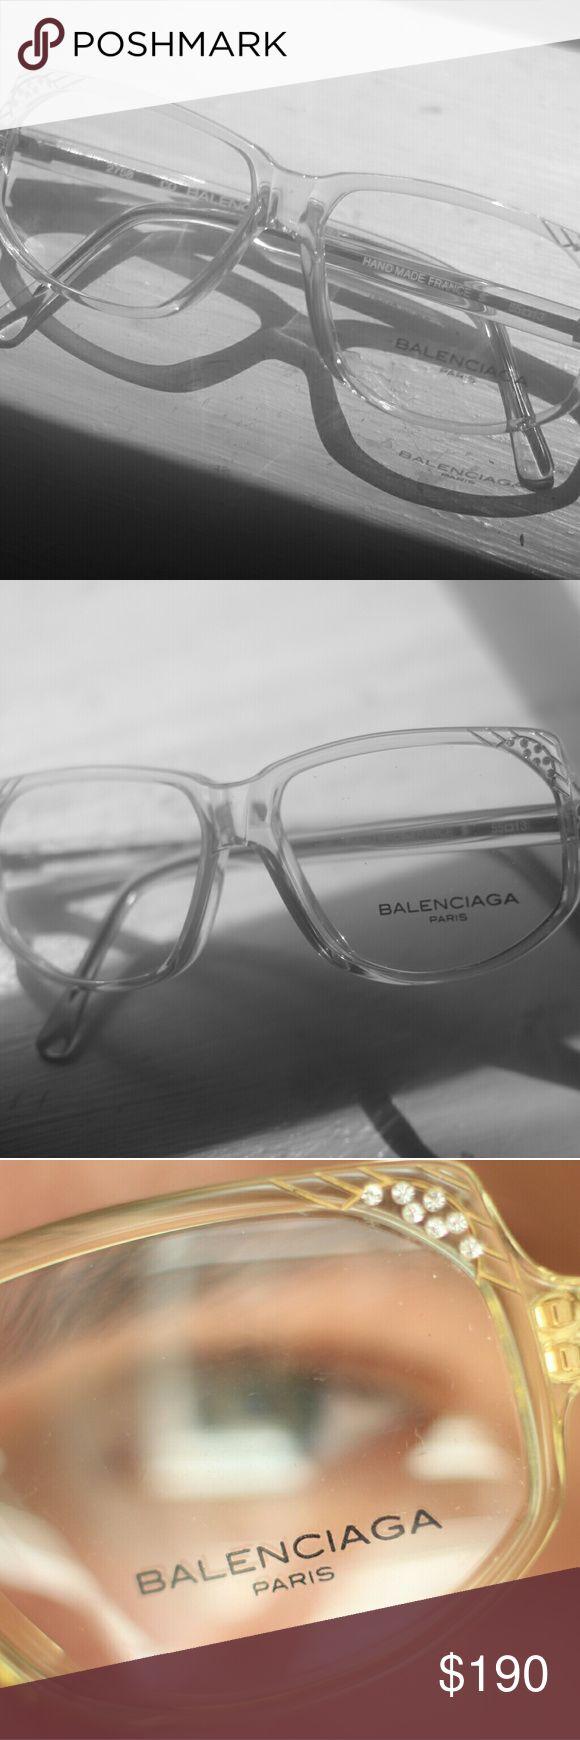 RARE Authentic Balenciaga Vintage Glasses AUTHENTIC YELLOW TINT FRAMED 1900 VINTAGE GLASSES! EXCELLENT CONDITION! RARE Balenciaga Accessories Glasses